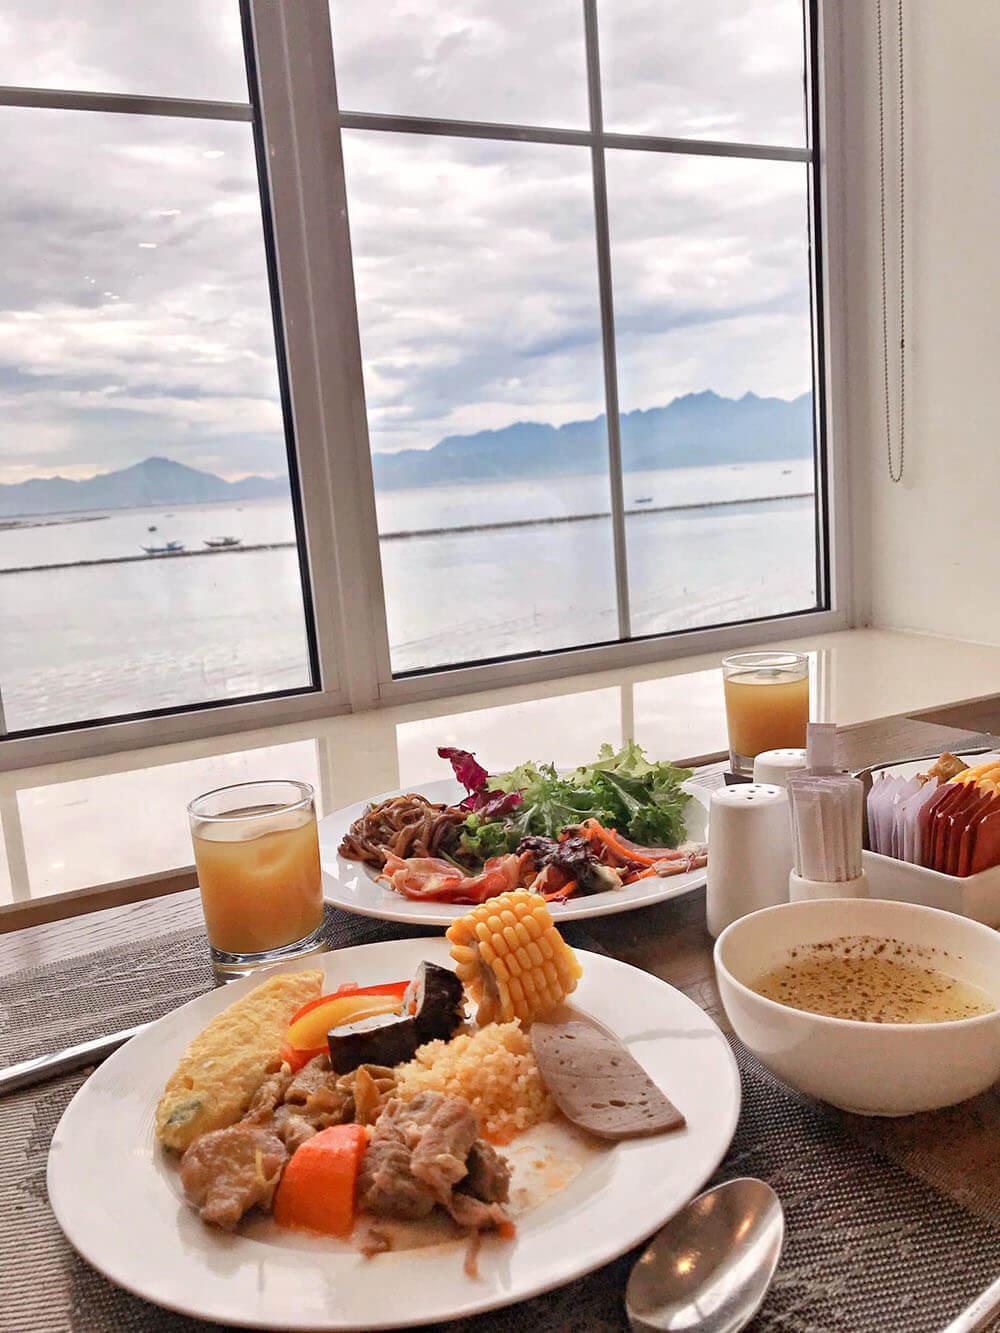 Danang Golden Bay Review Chuyen Du Lich Hoi An Da Nang Chanh Sa 3n2d 07